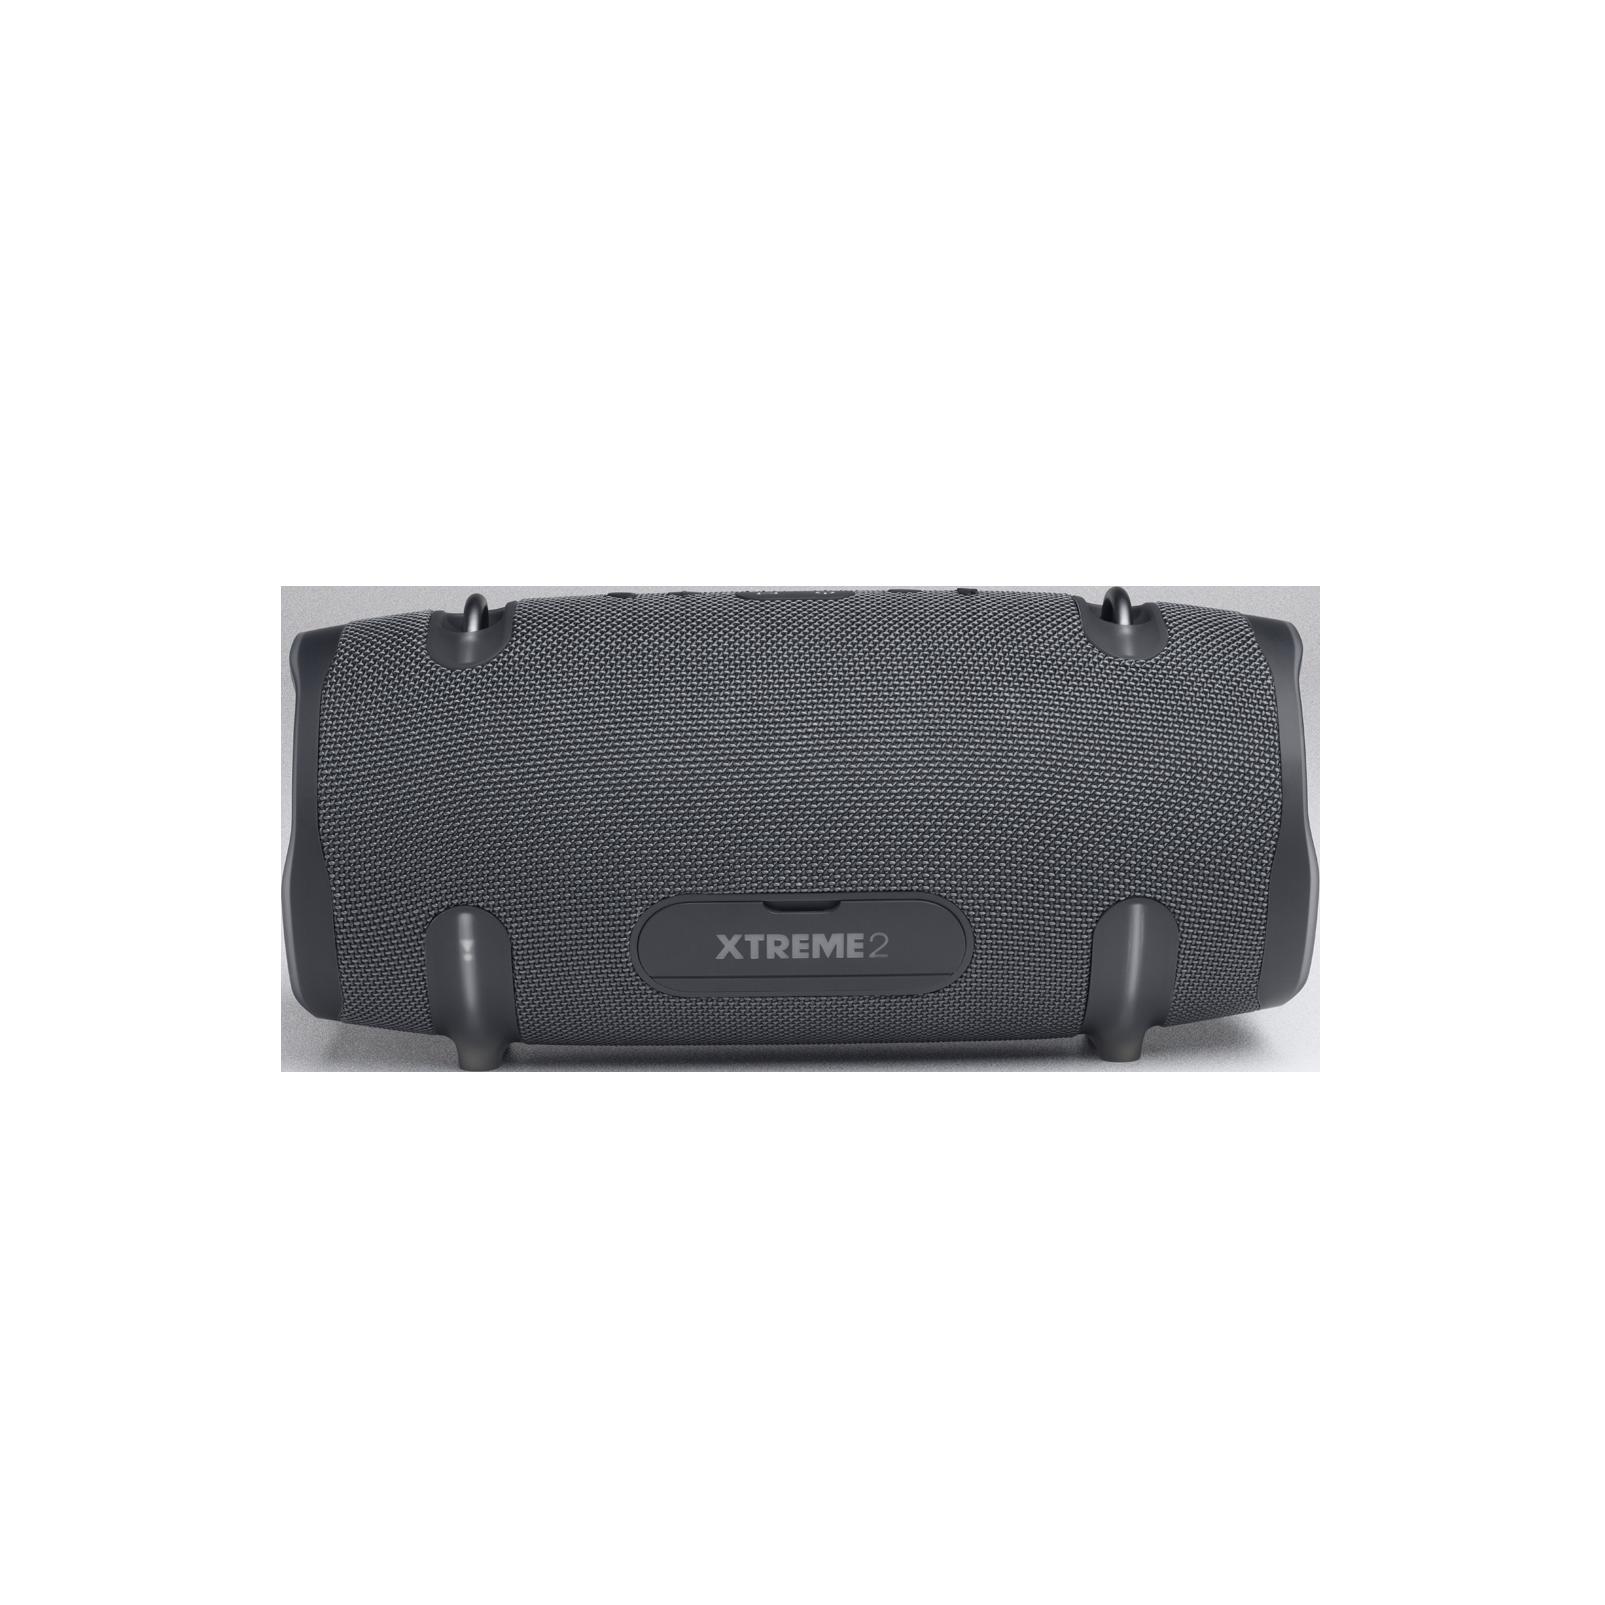 JBL Xtreme 2 Gun Metal - Gun Metal - Portable Bluetooth Speaker - Back